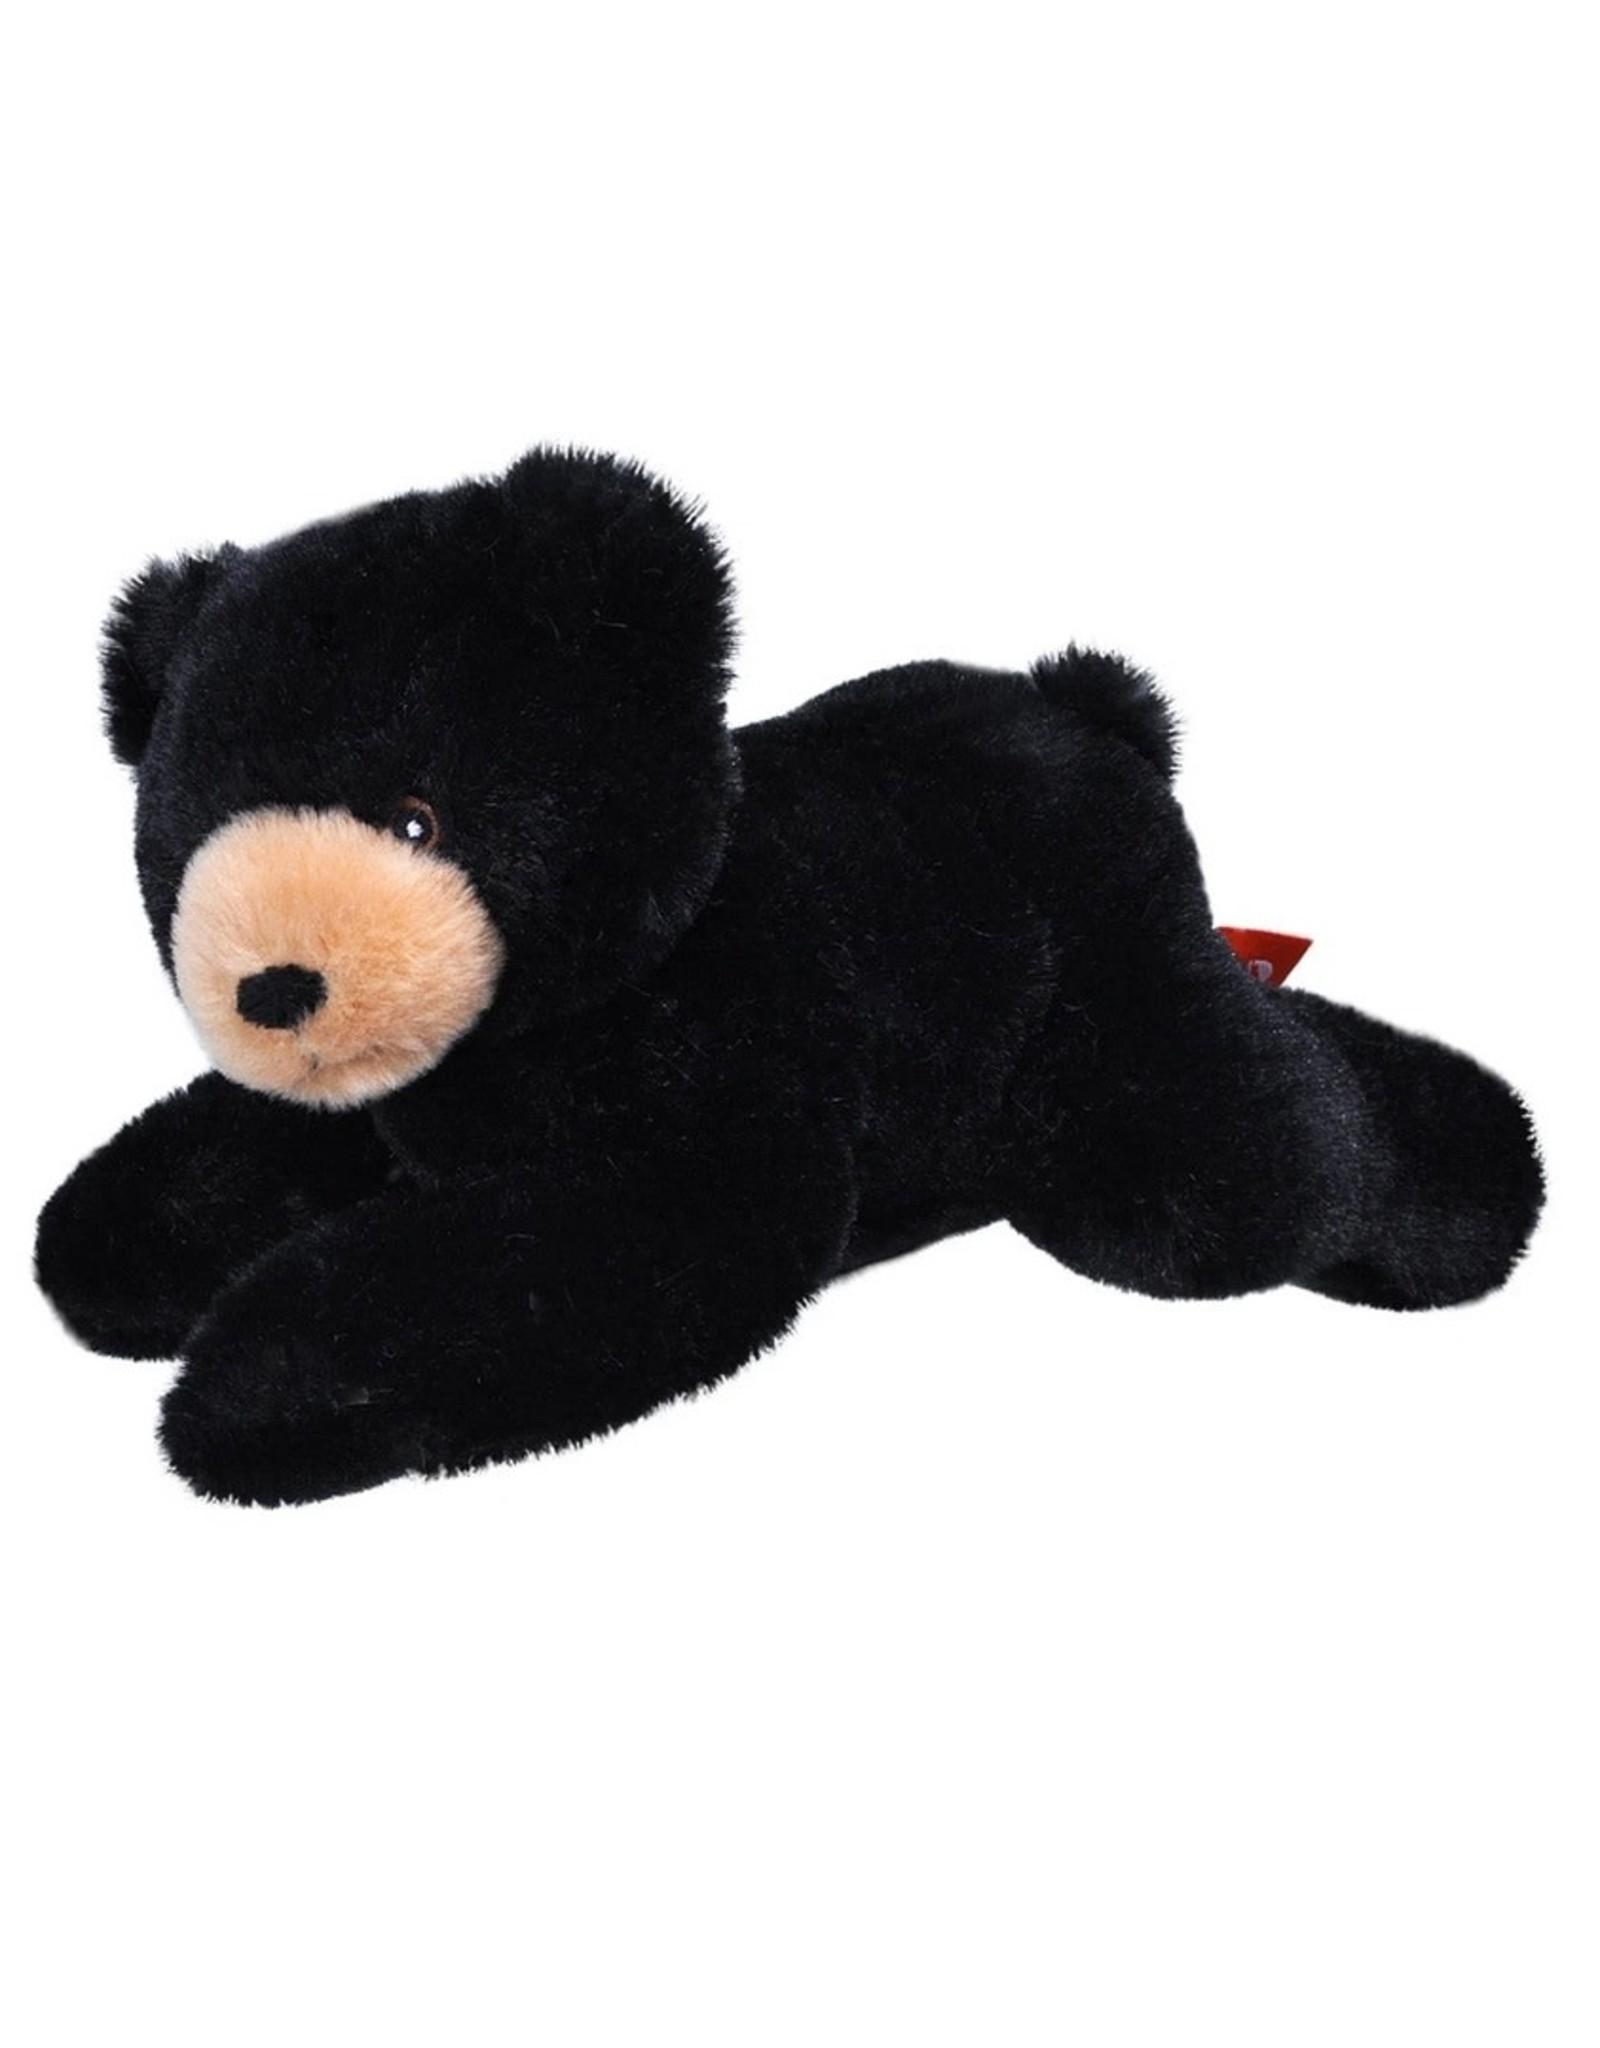 Wild Republic EcoKins - black bear